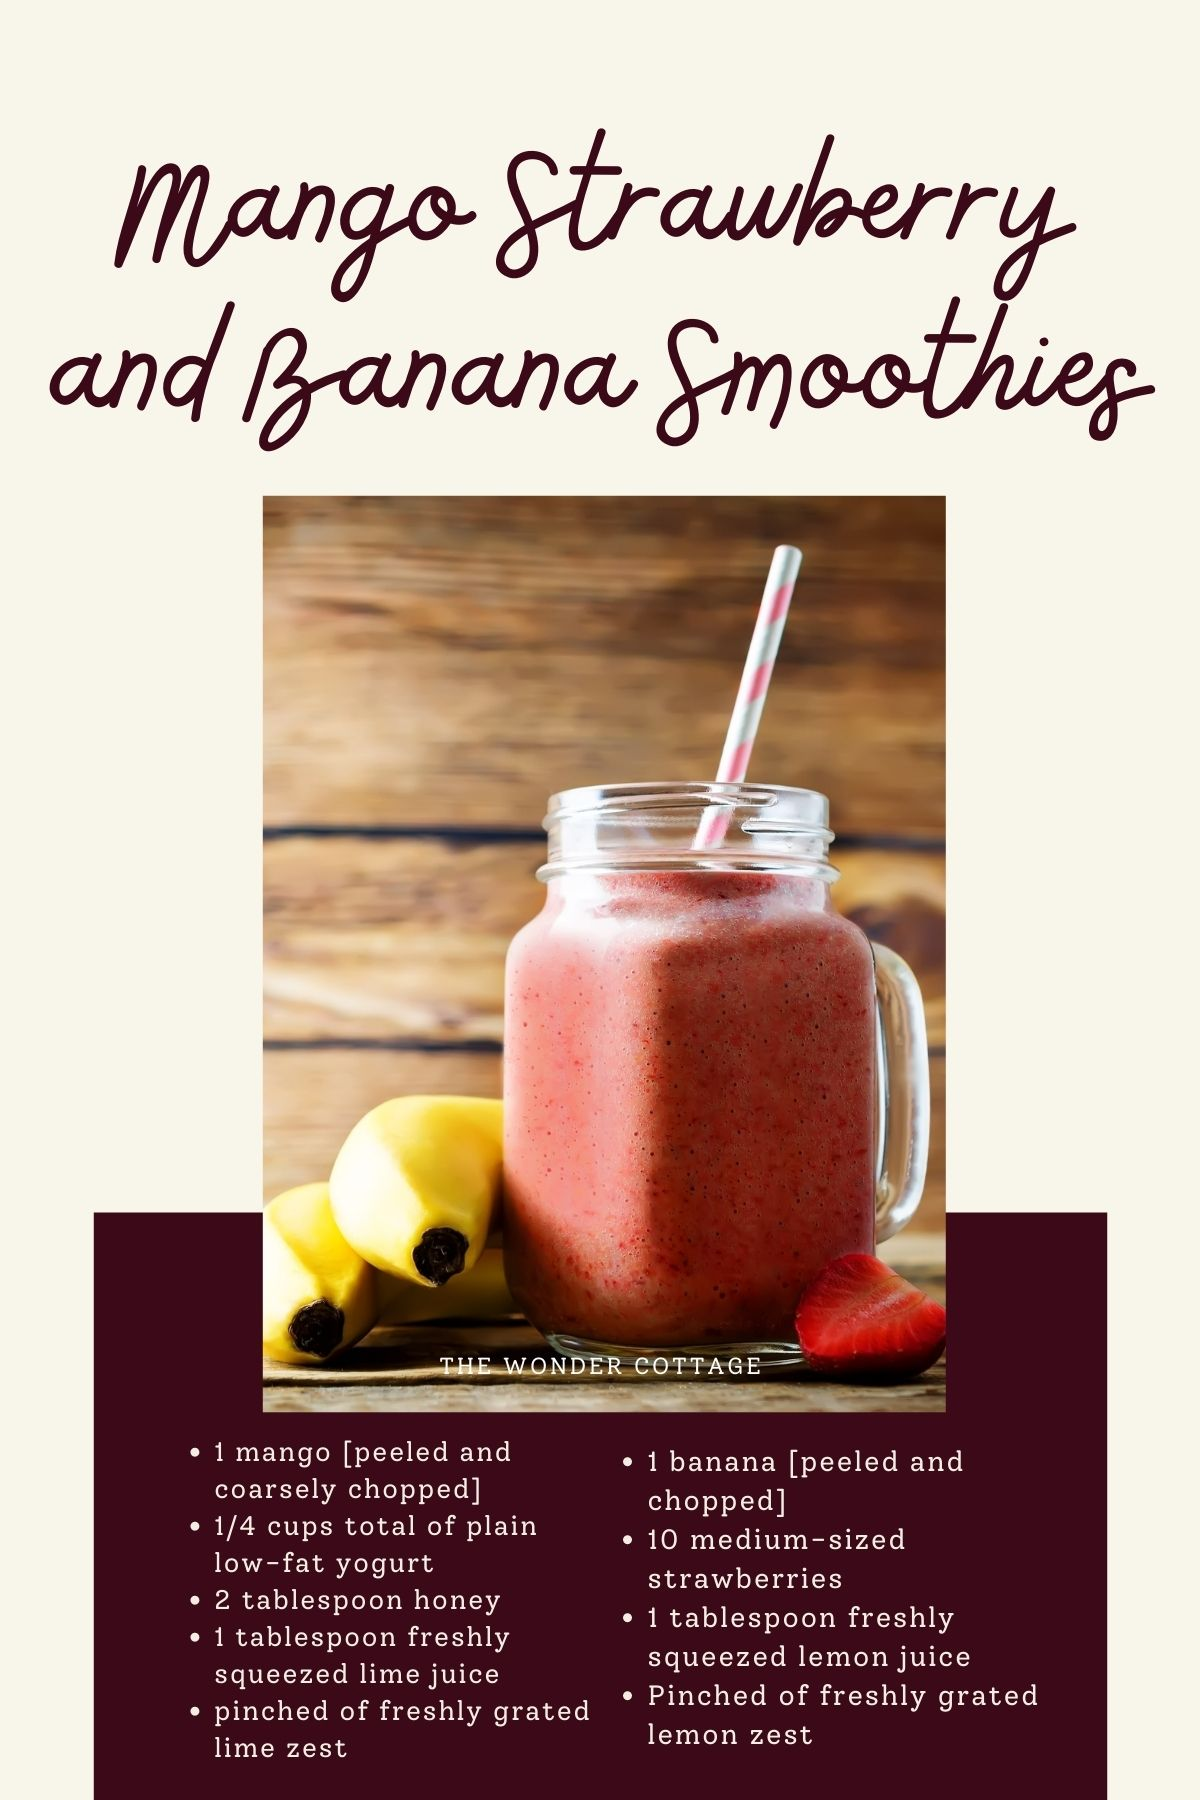 Mango strawberry and banana smoothies